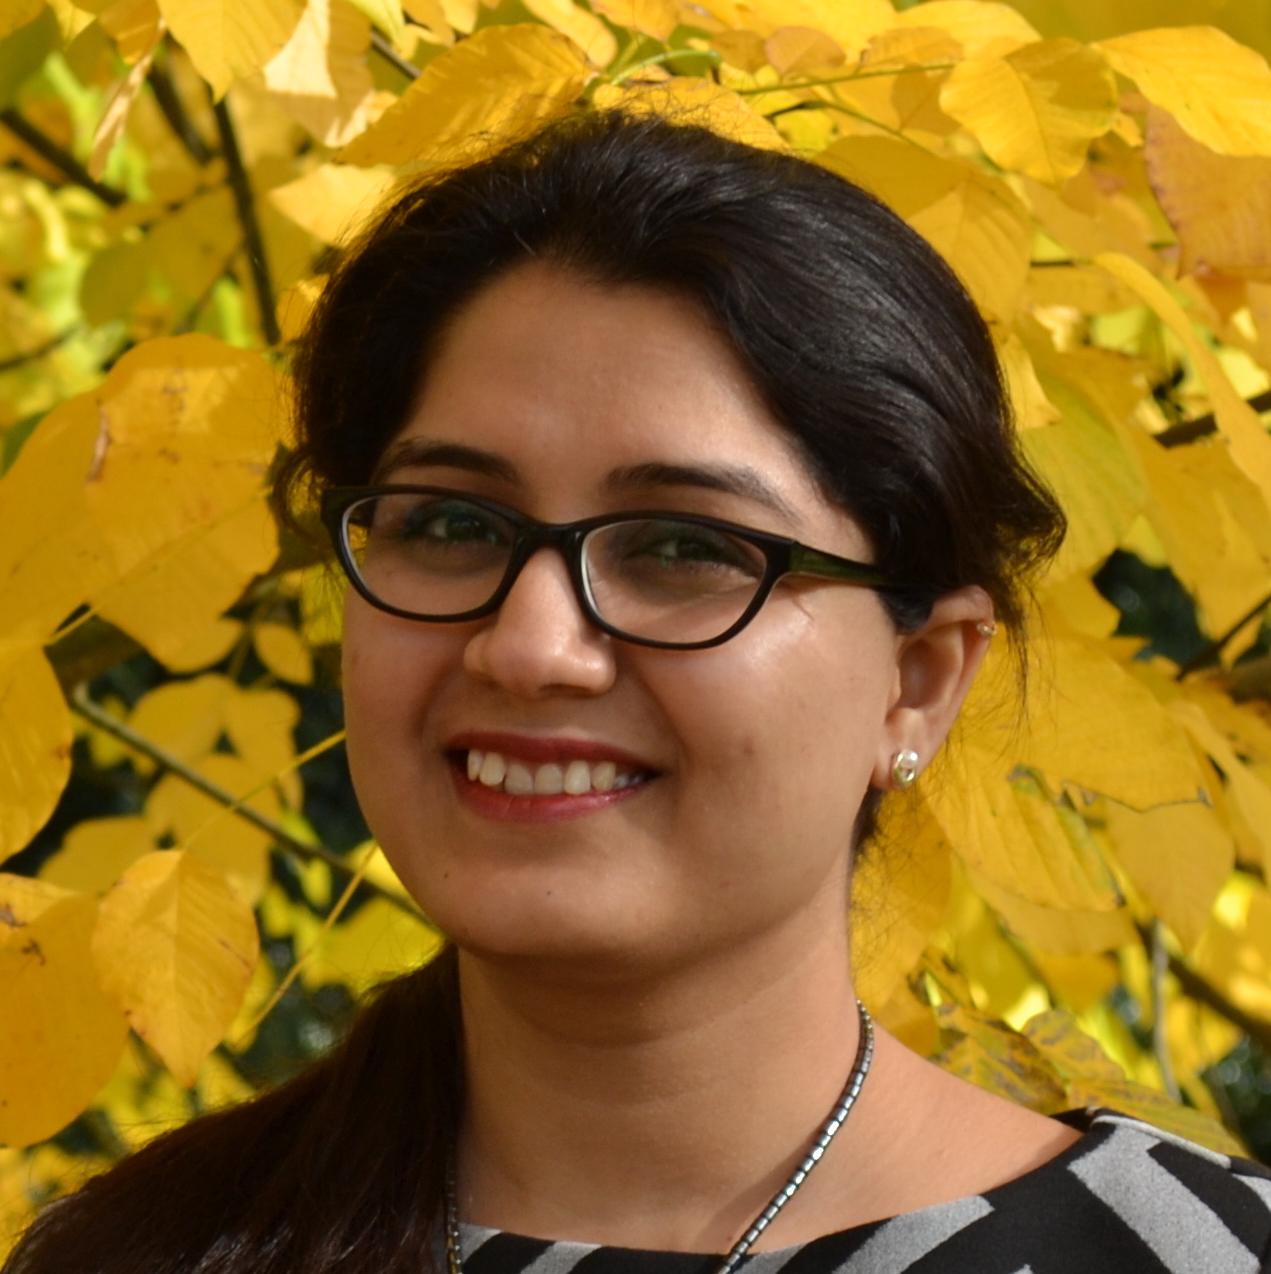 Richa Malhotra